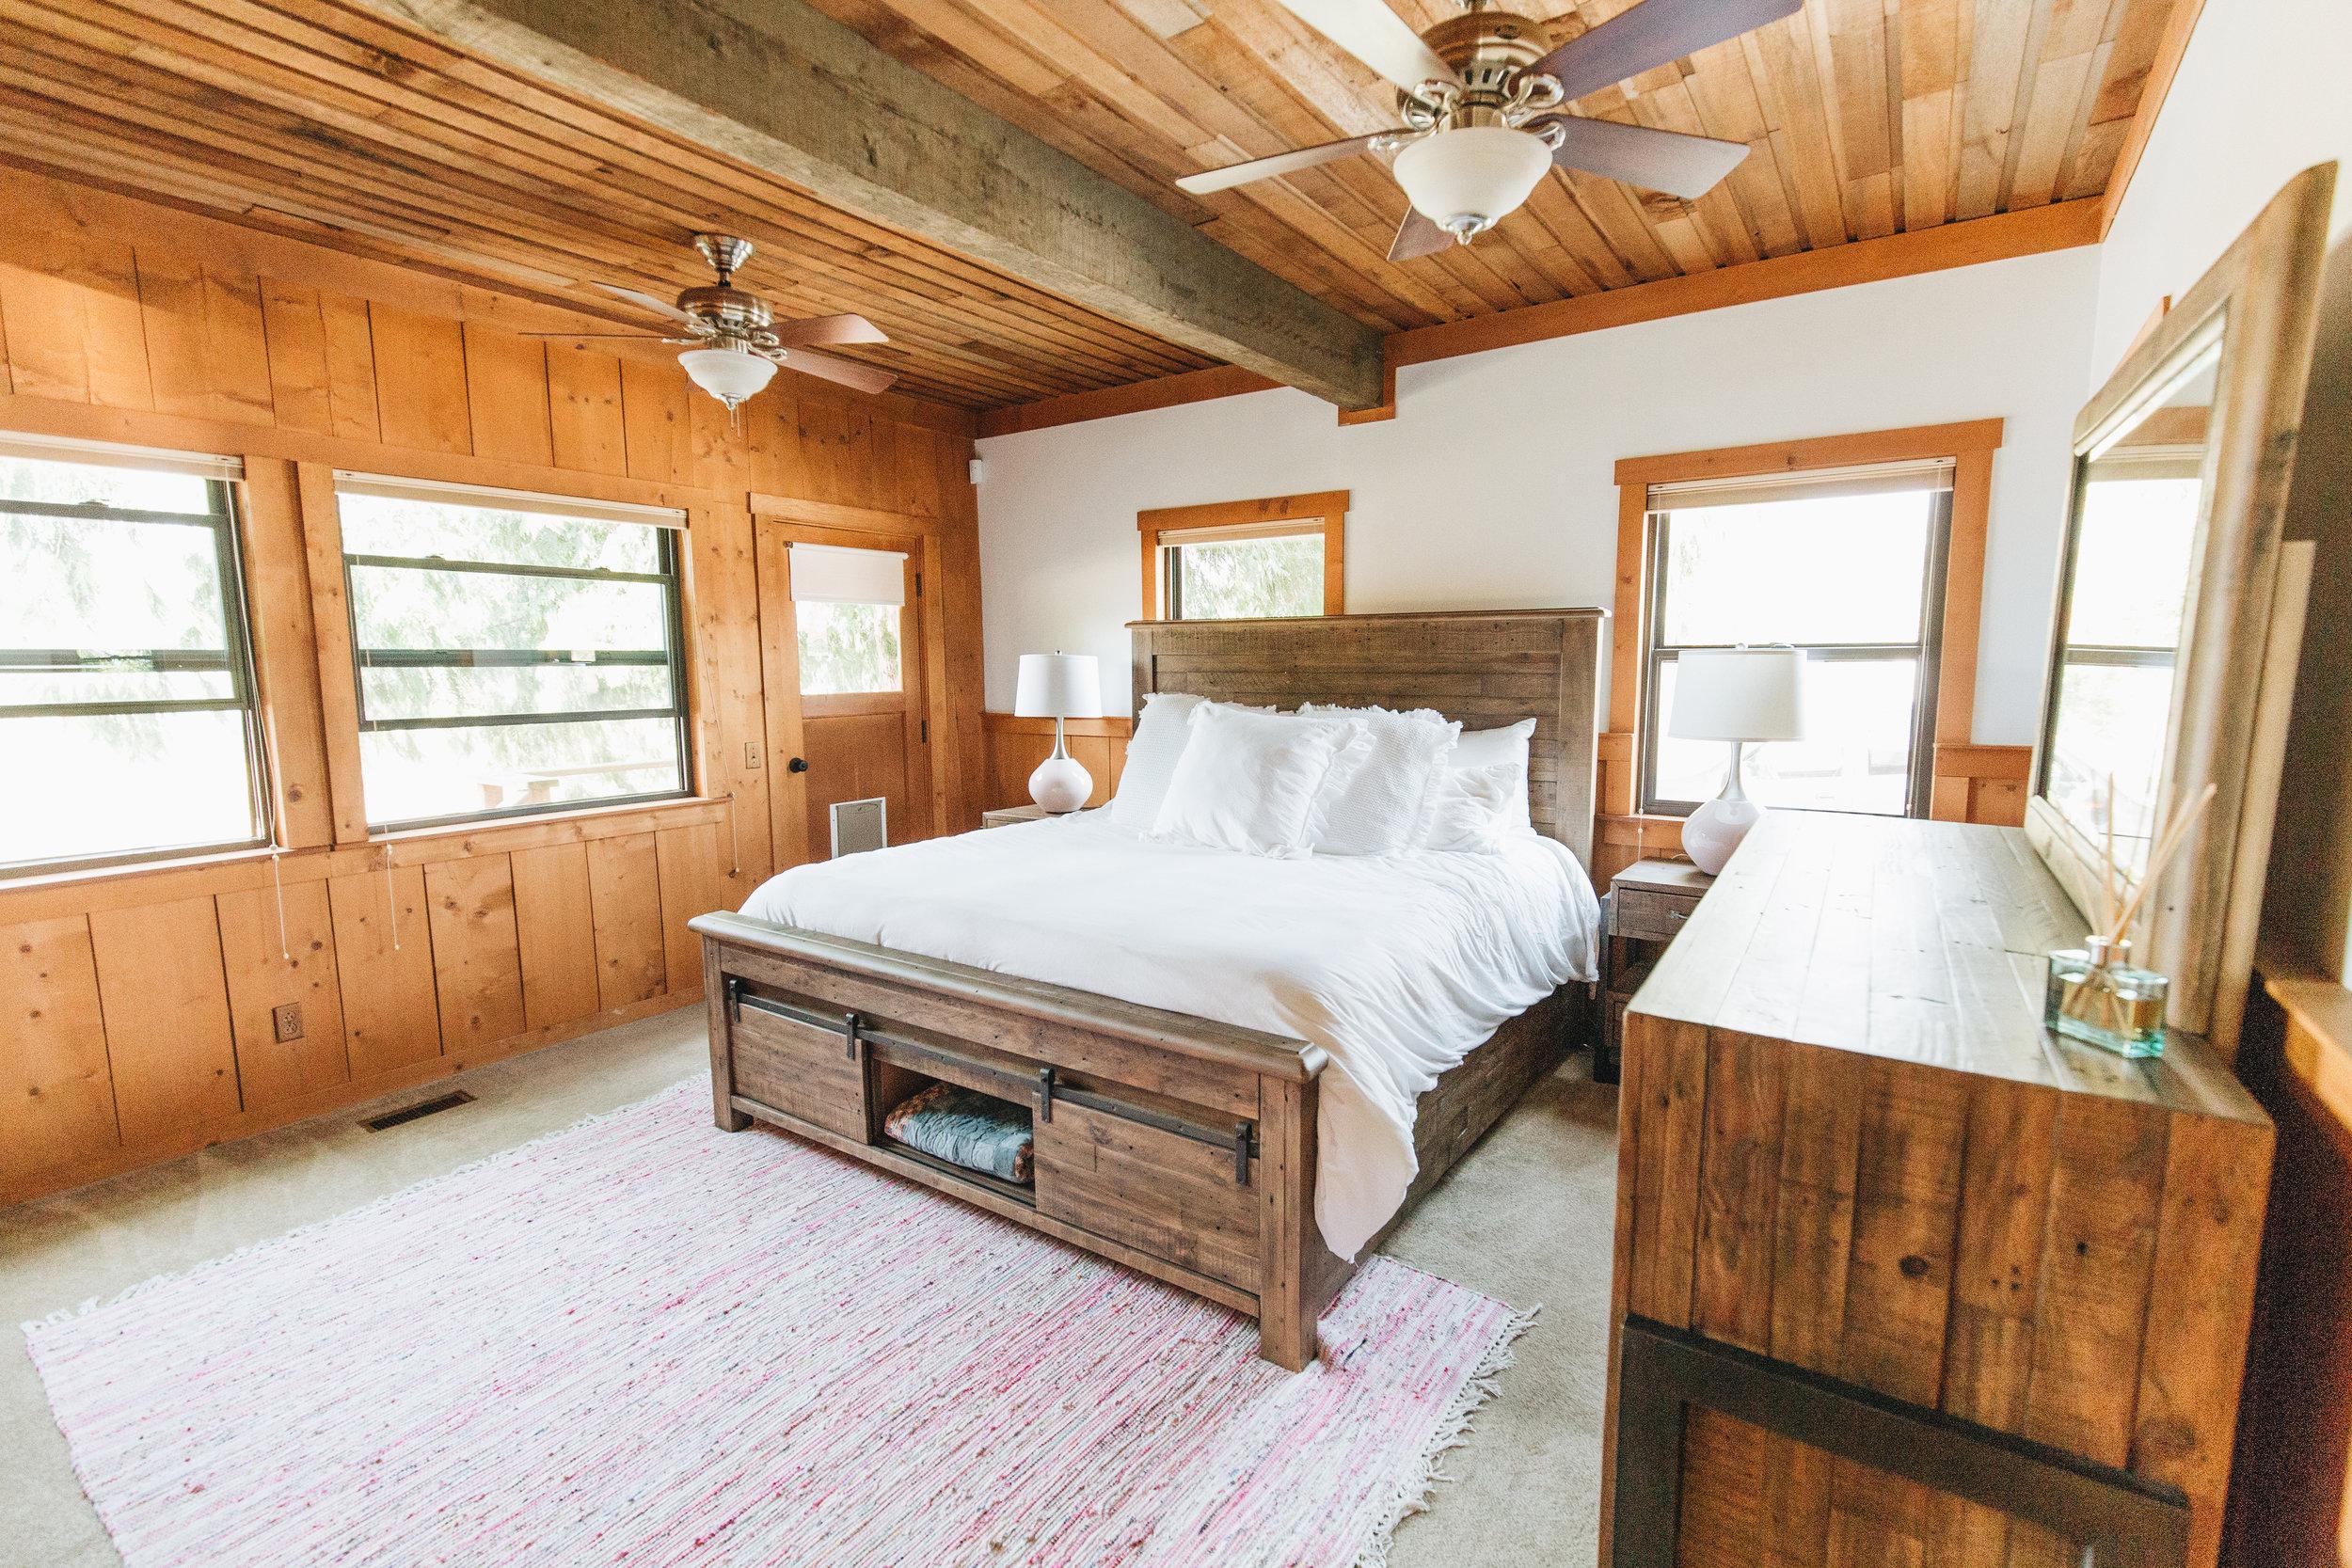 Lake Tapps, WA airbnb house rental